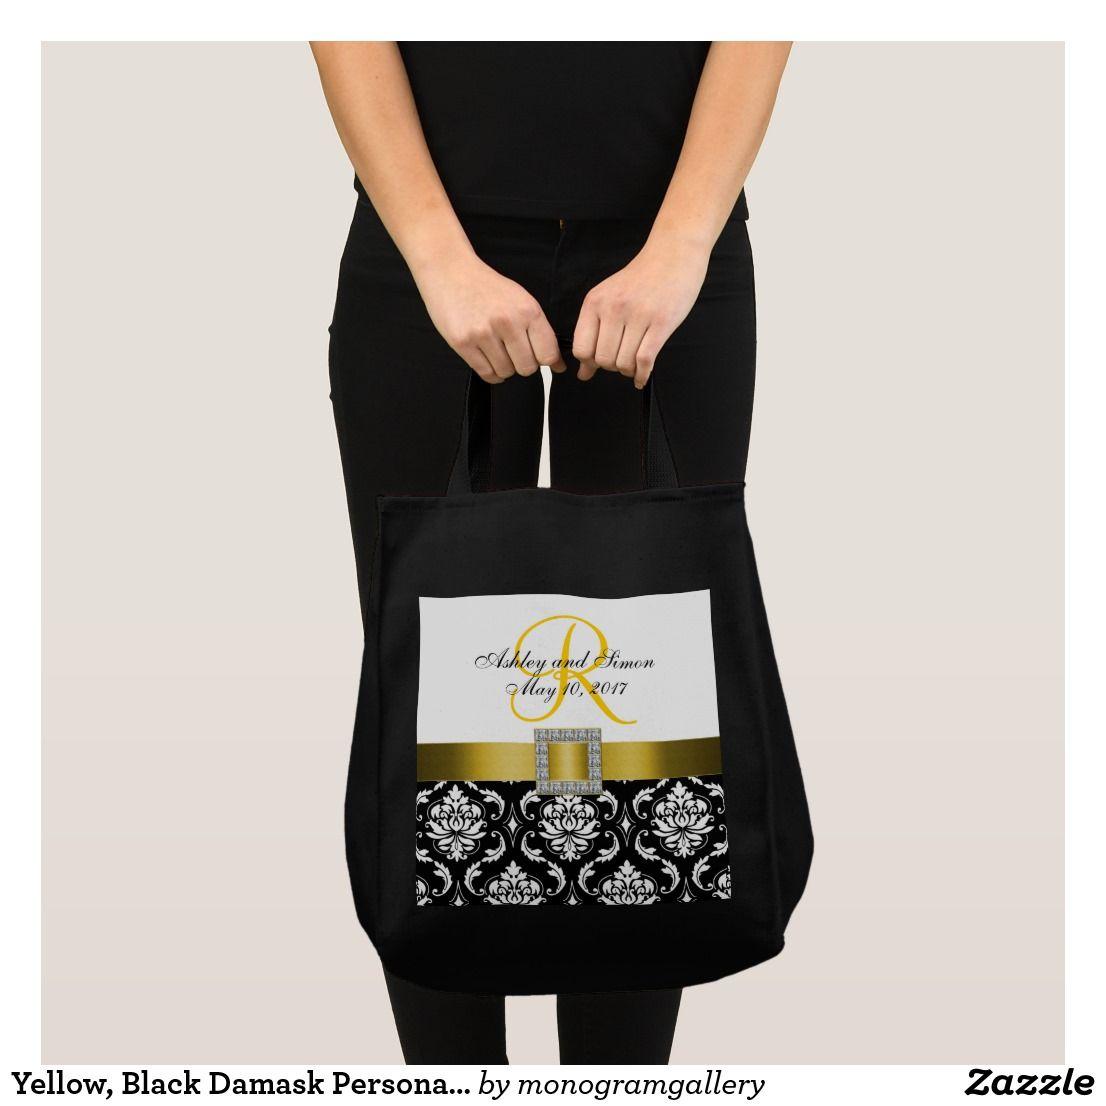 yellow black damask personalized wedding tote bag wedding tote